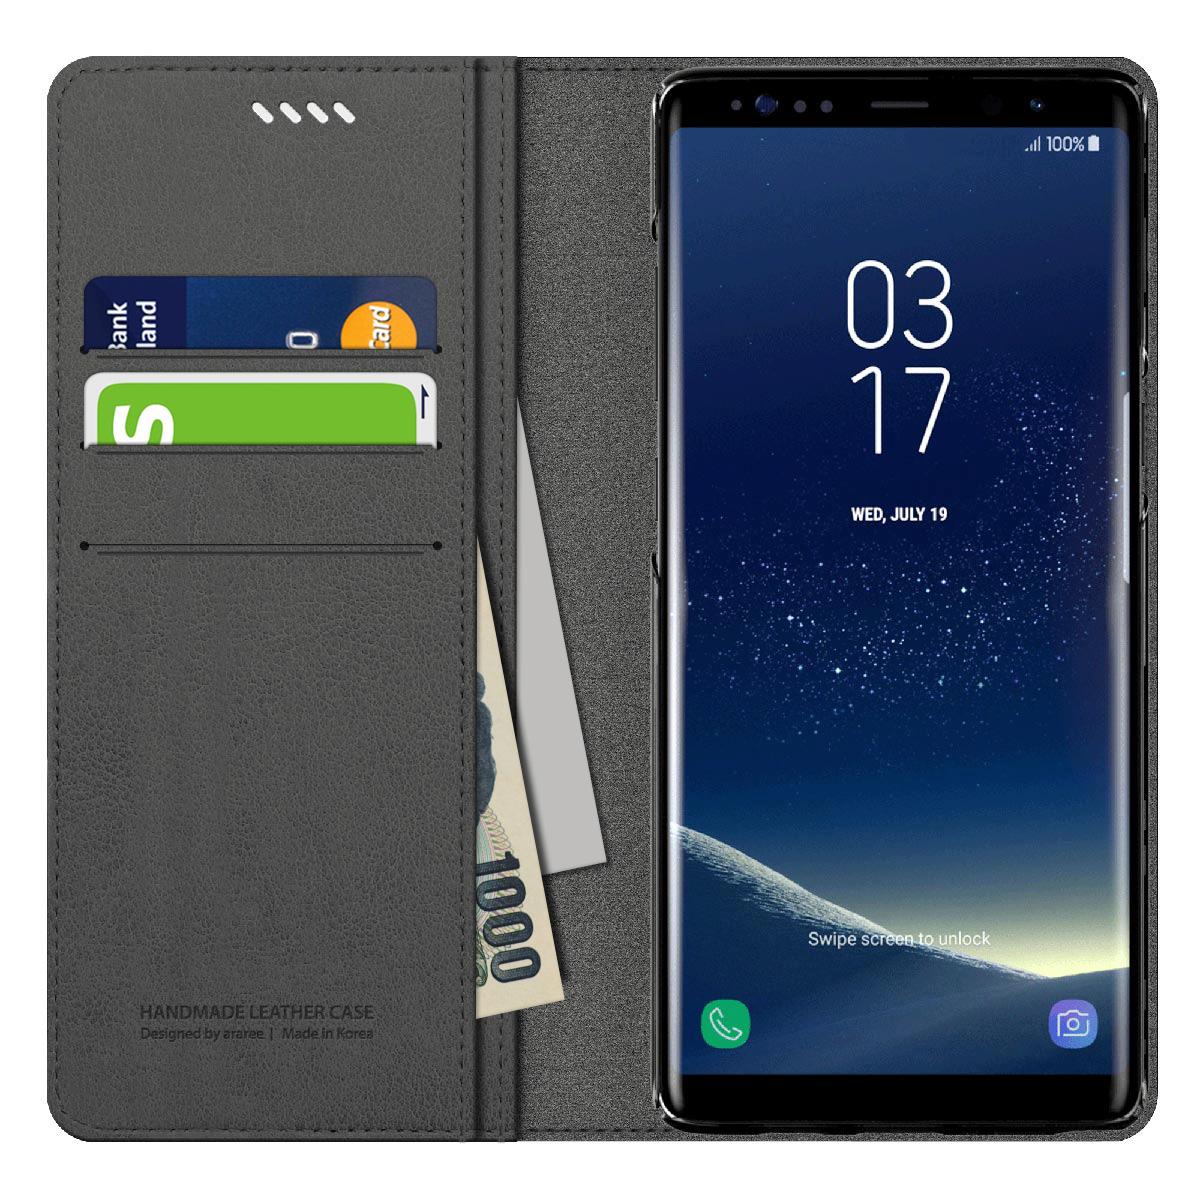 Galaxy Note9 ケース Galaxy Note8 ケース 手帳型 araree MUSTANG DIARY(アラリー マスタング ダイアリー)ギャラクシー ノート カバー SC-01L SCV40 SC-01K SCV37 プレミアム素材